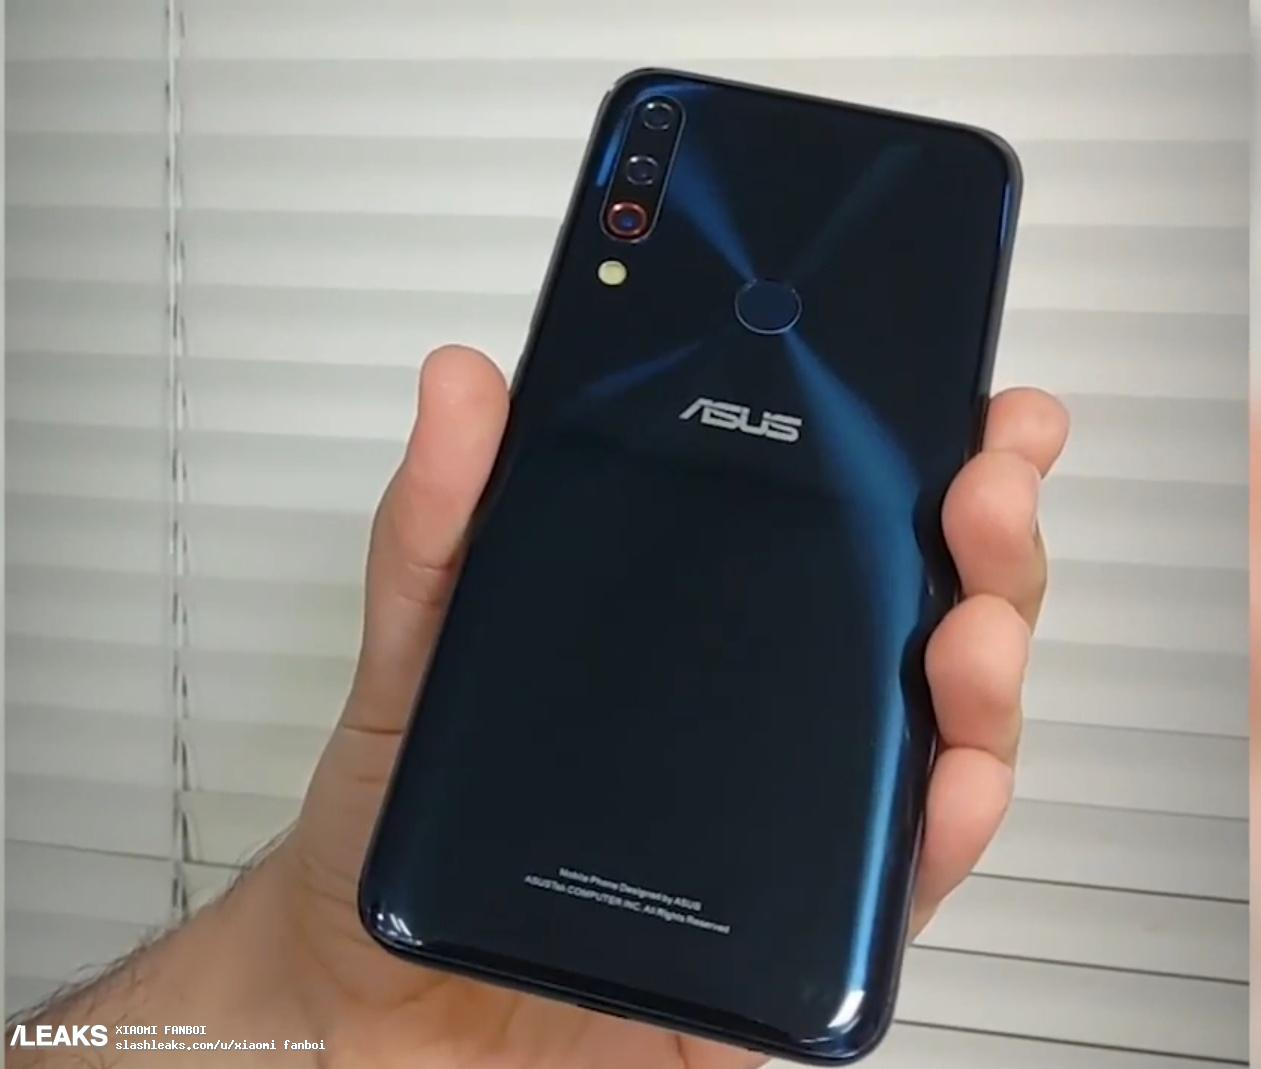 asus-zenfone-6-prototypes-leaked-306